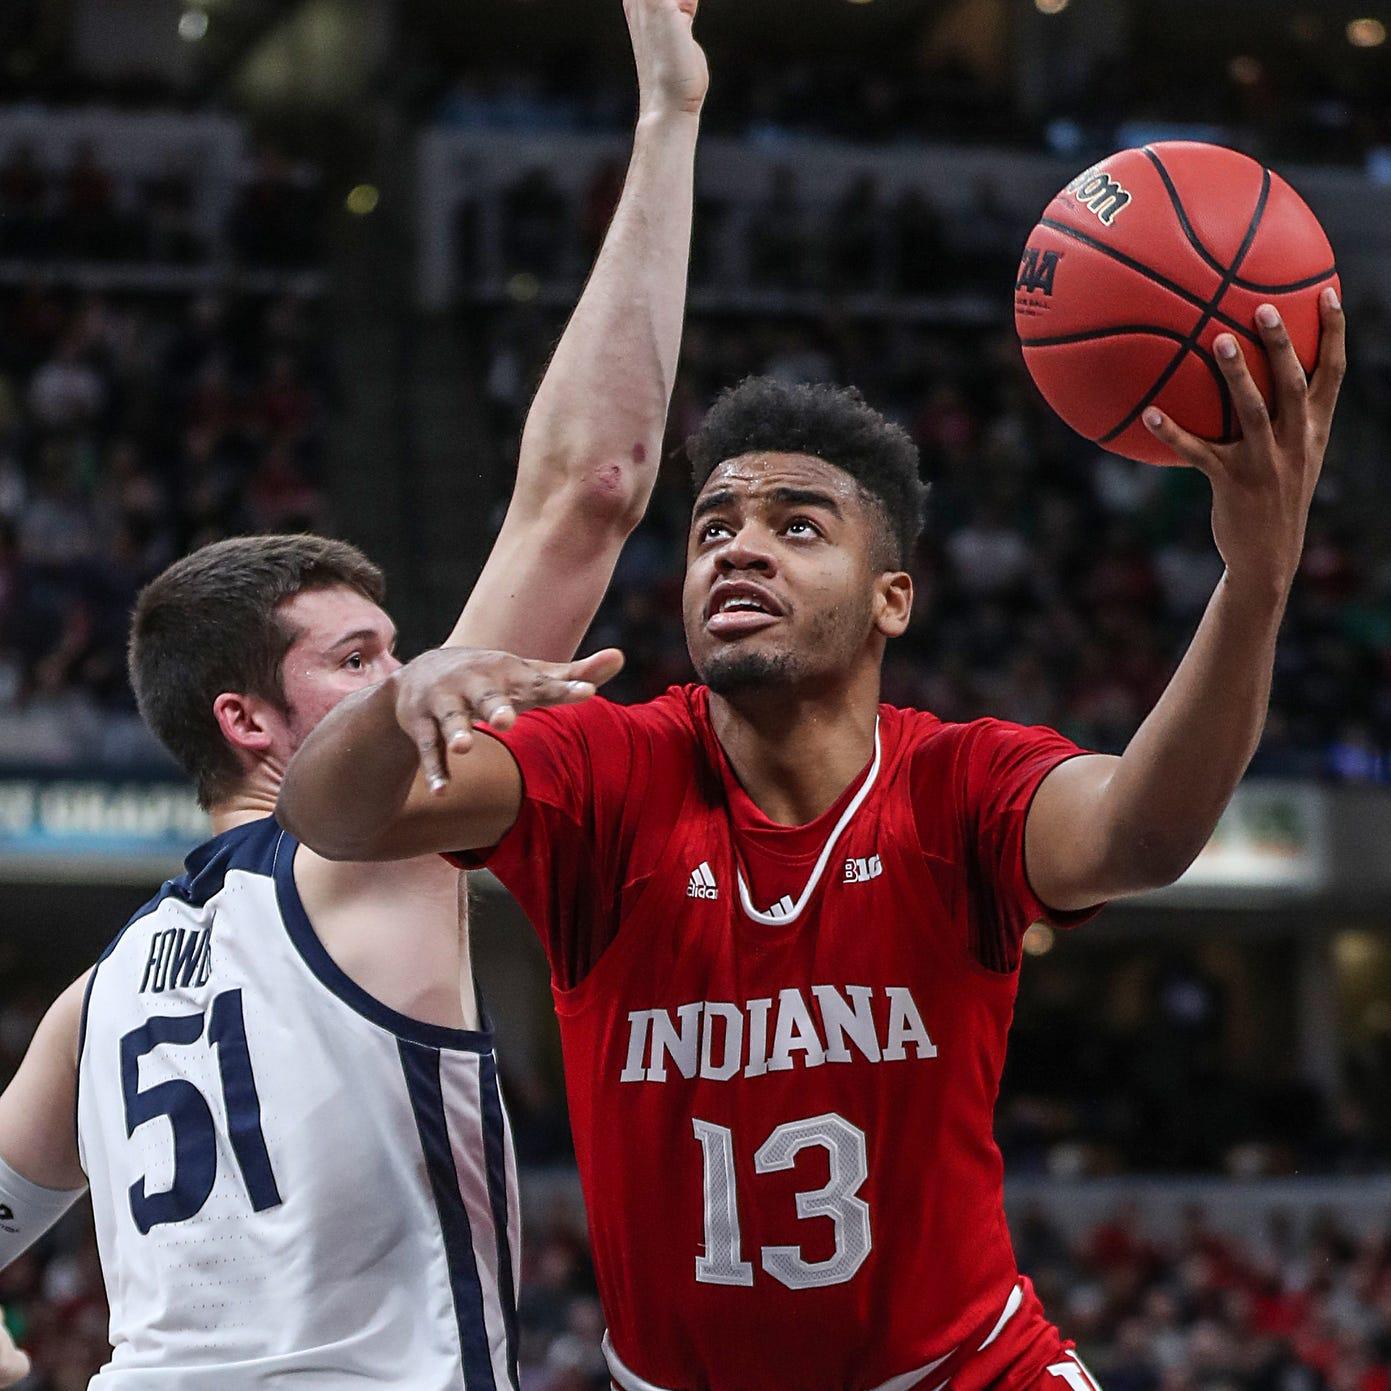 Insider: Make no mistake, Juwan Morgan joining likes of IU basketball greats